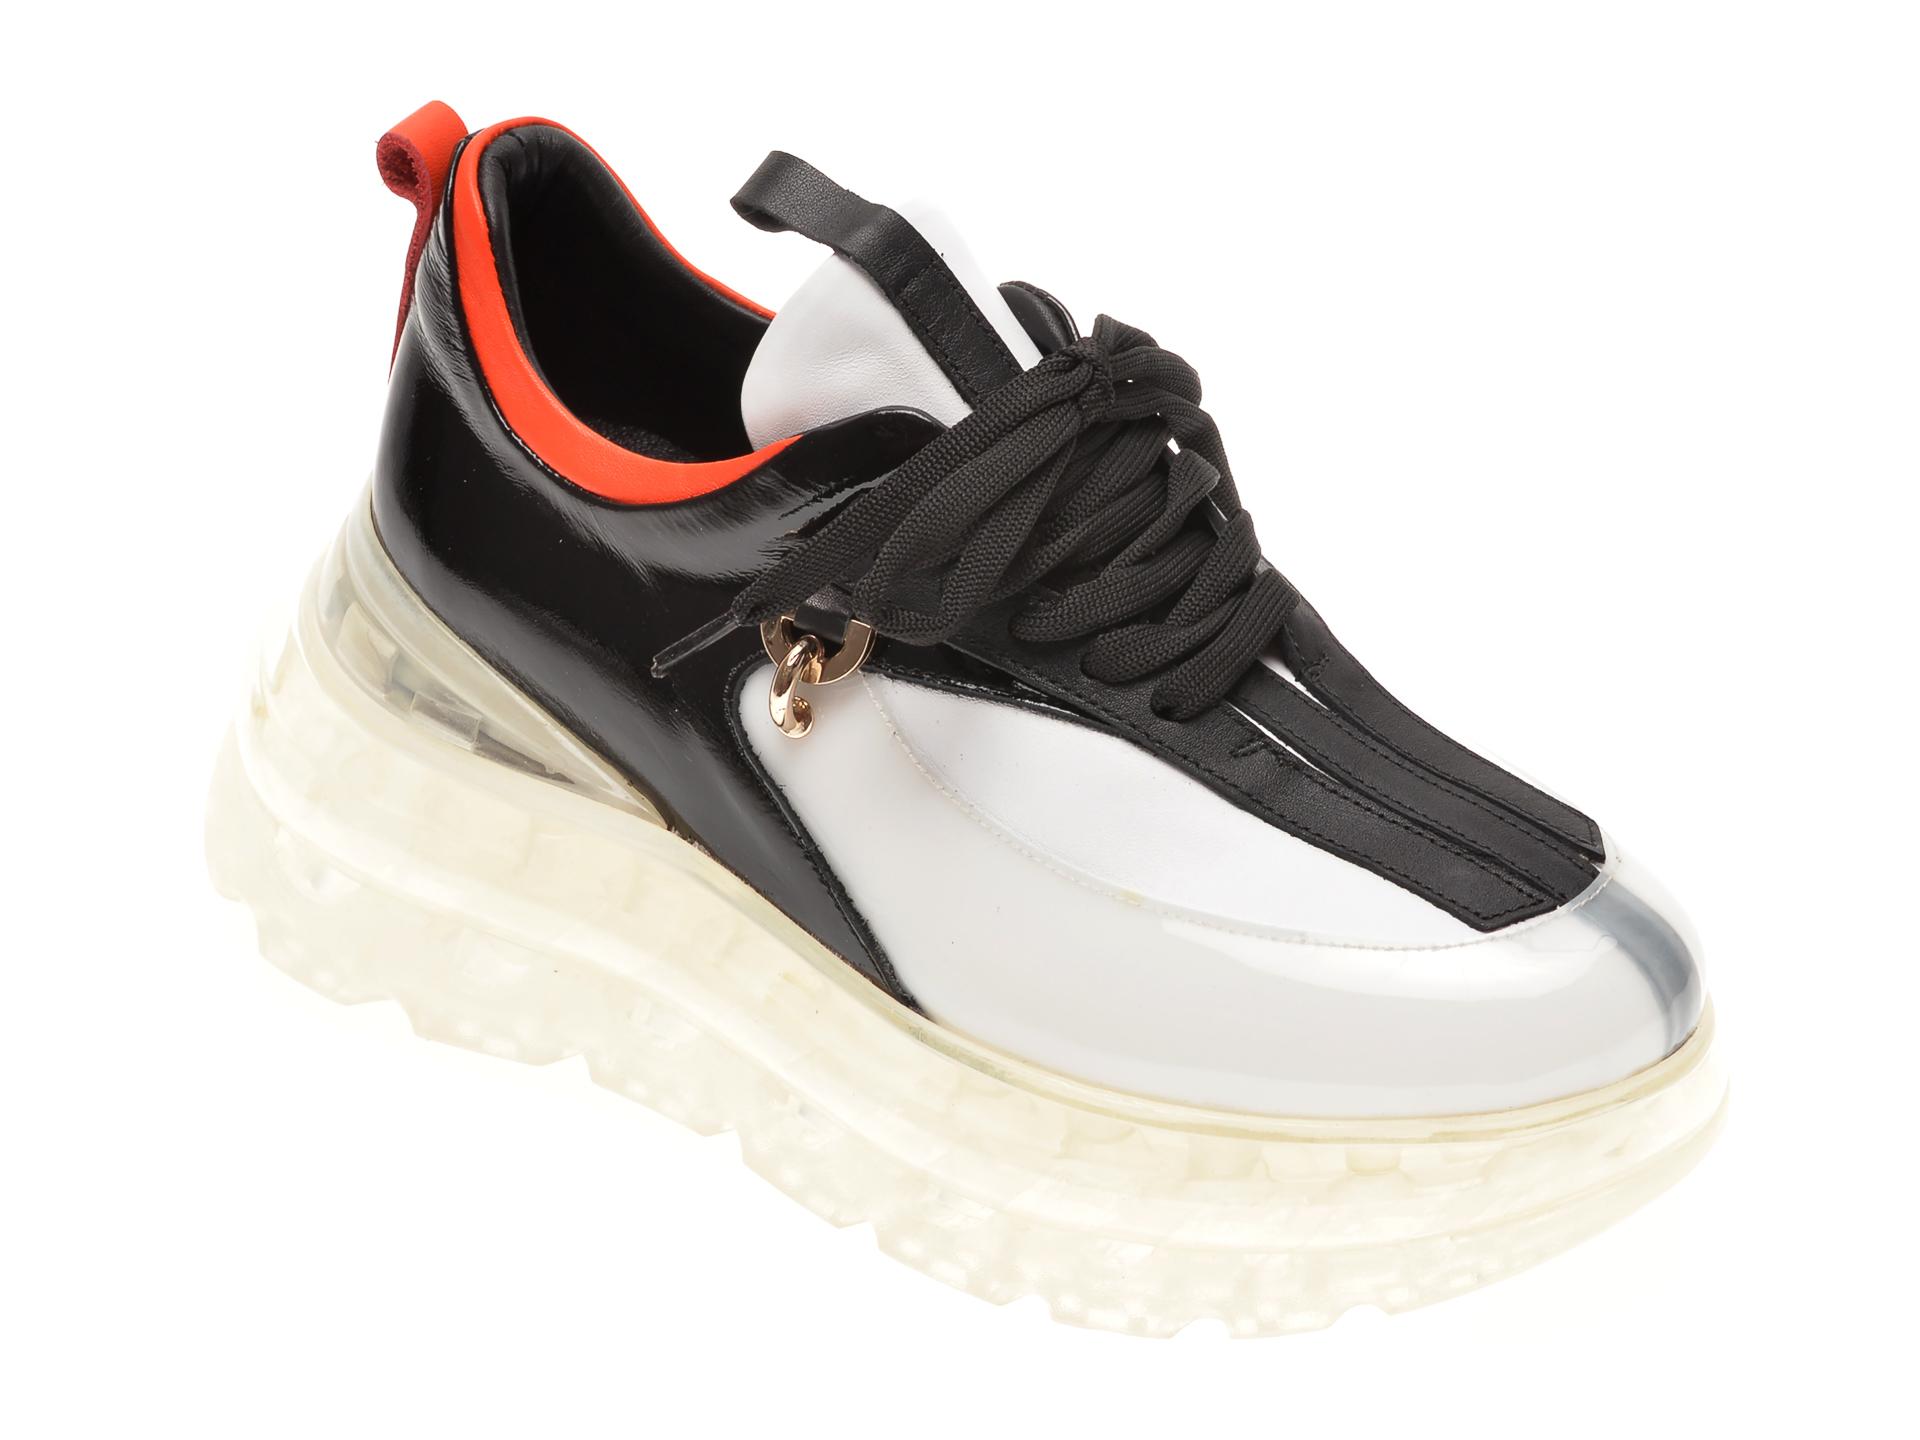 Pantofi sport FLAVIA PASSINI alb negri, 135P46, din piele naturala imagine